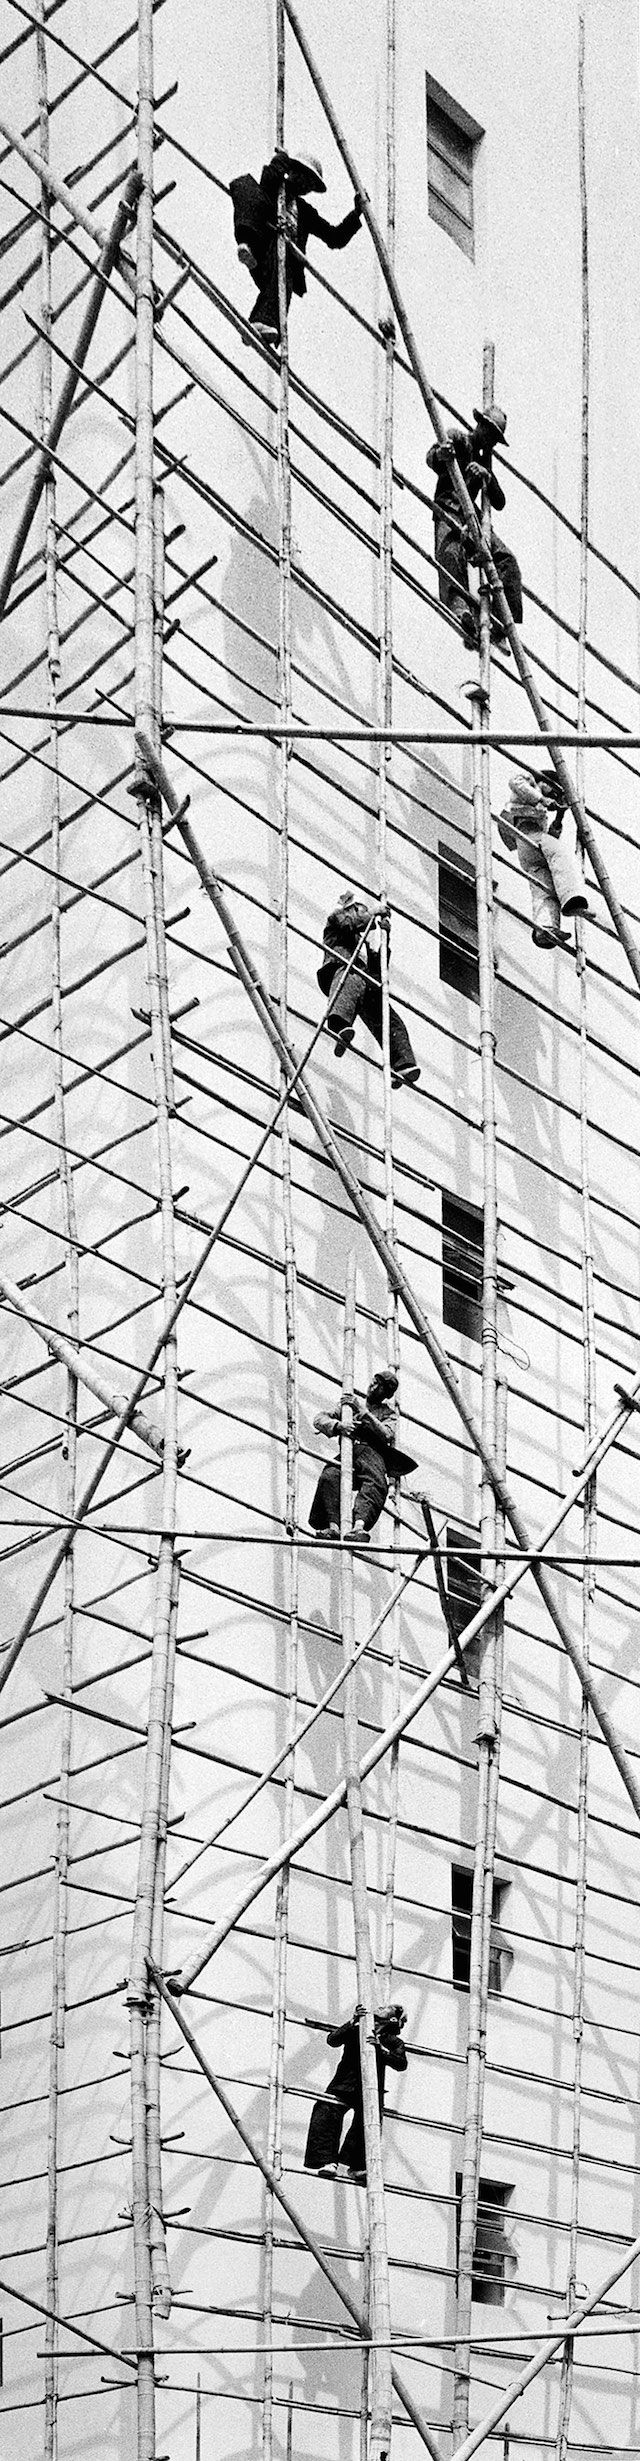 Hong Kong 1950′s Memory Photography http://www.fubiz.net/en/2014/09/11/hong-kong-1950s-memory-photography/